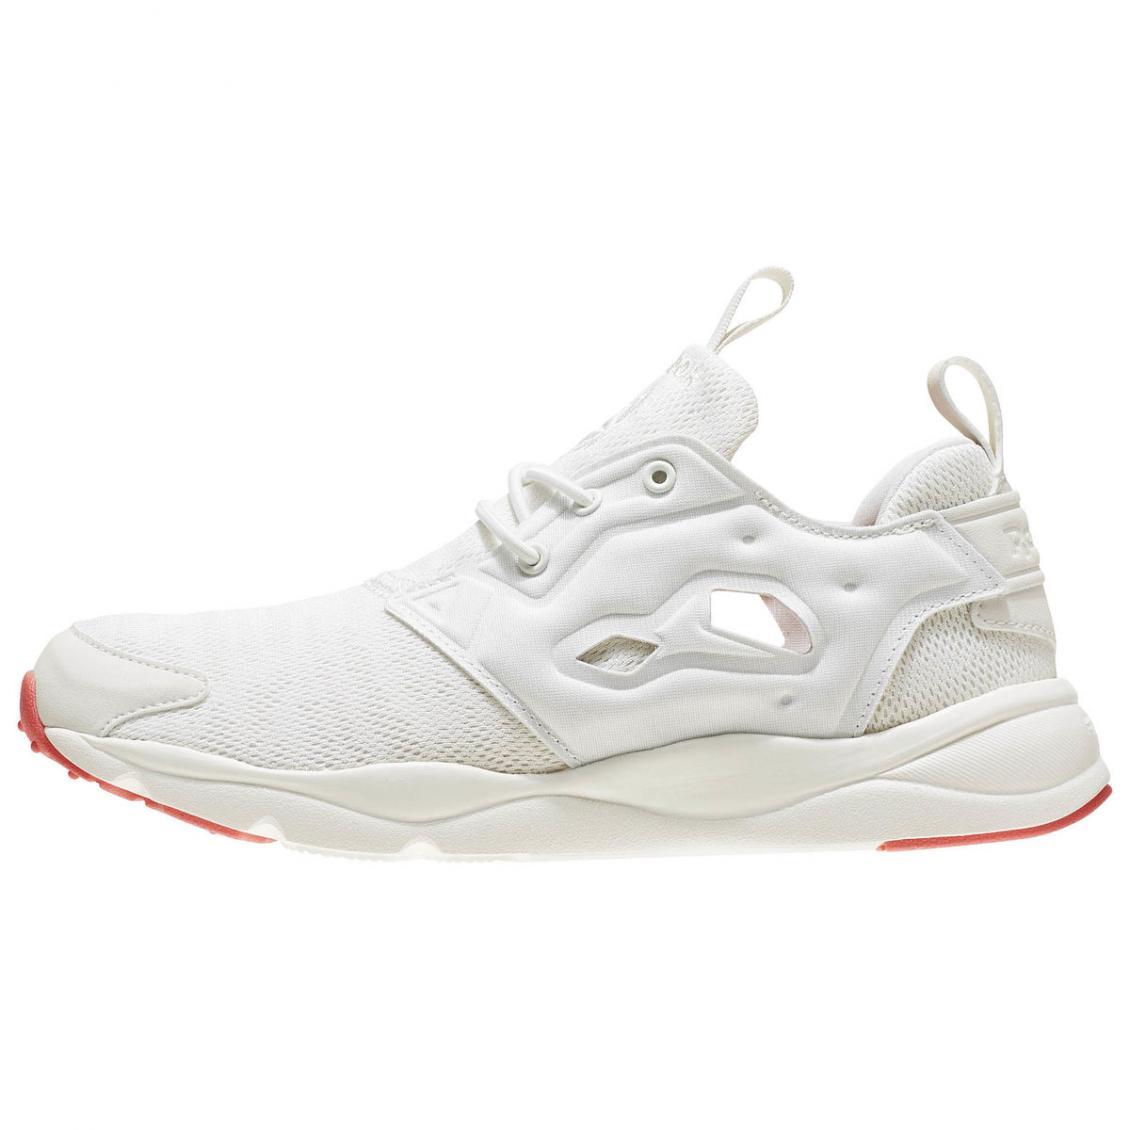 White – Reebok Furylite Sole Womens Classic White / Chalk / White / Fire Coral